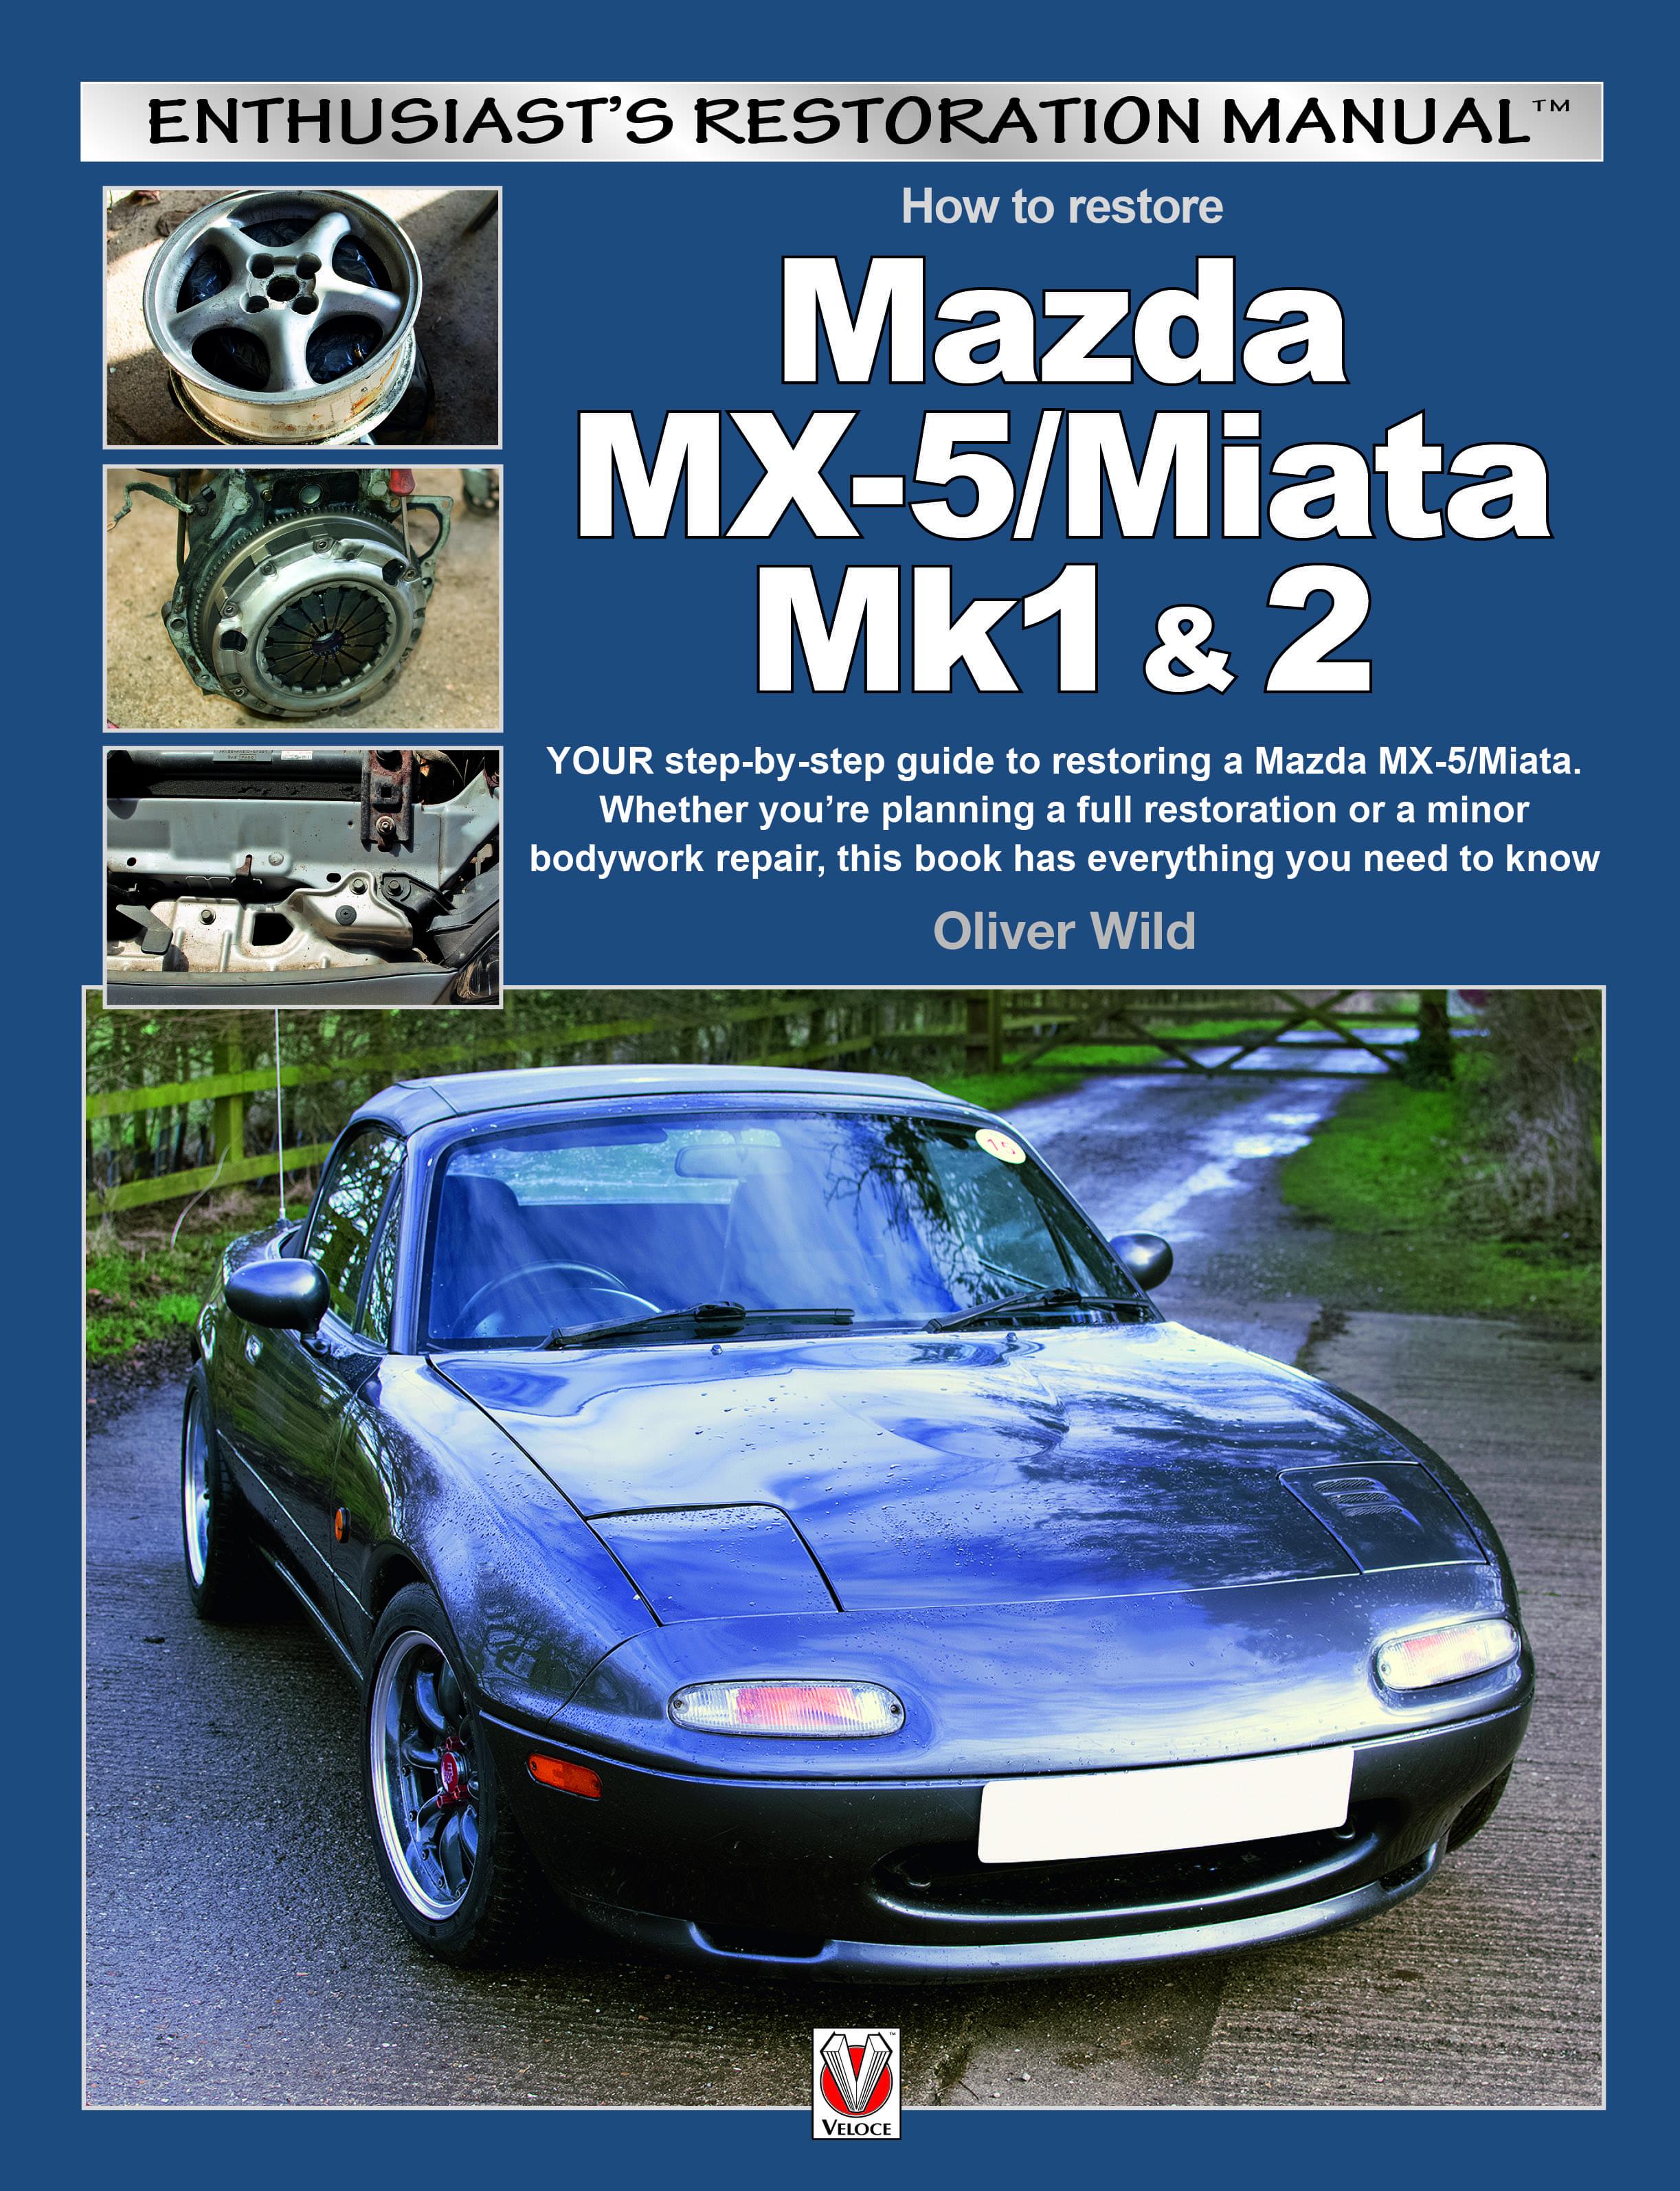 Mazda MX-5/Miata Mk1 & 2 – Enthusiasts Restoration Manual cover